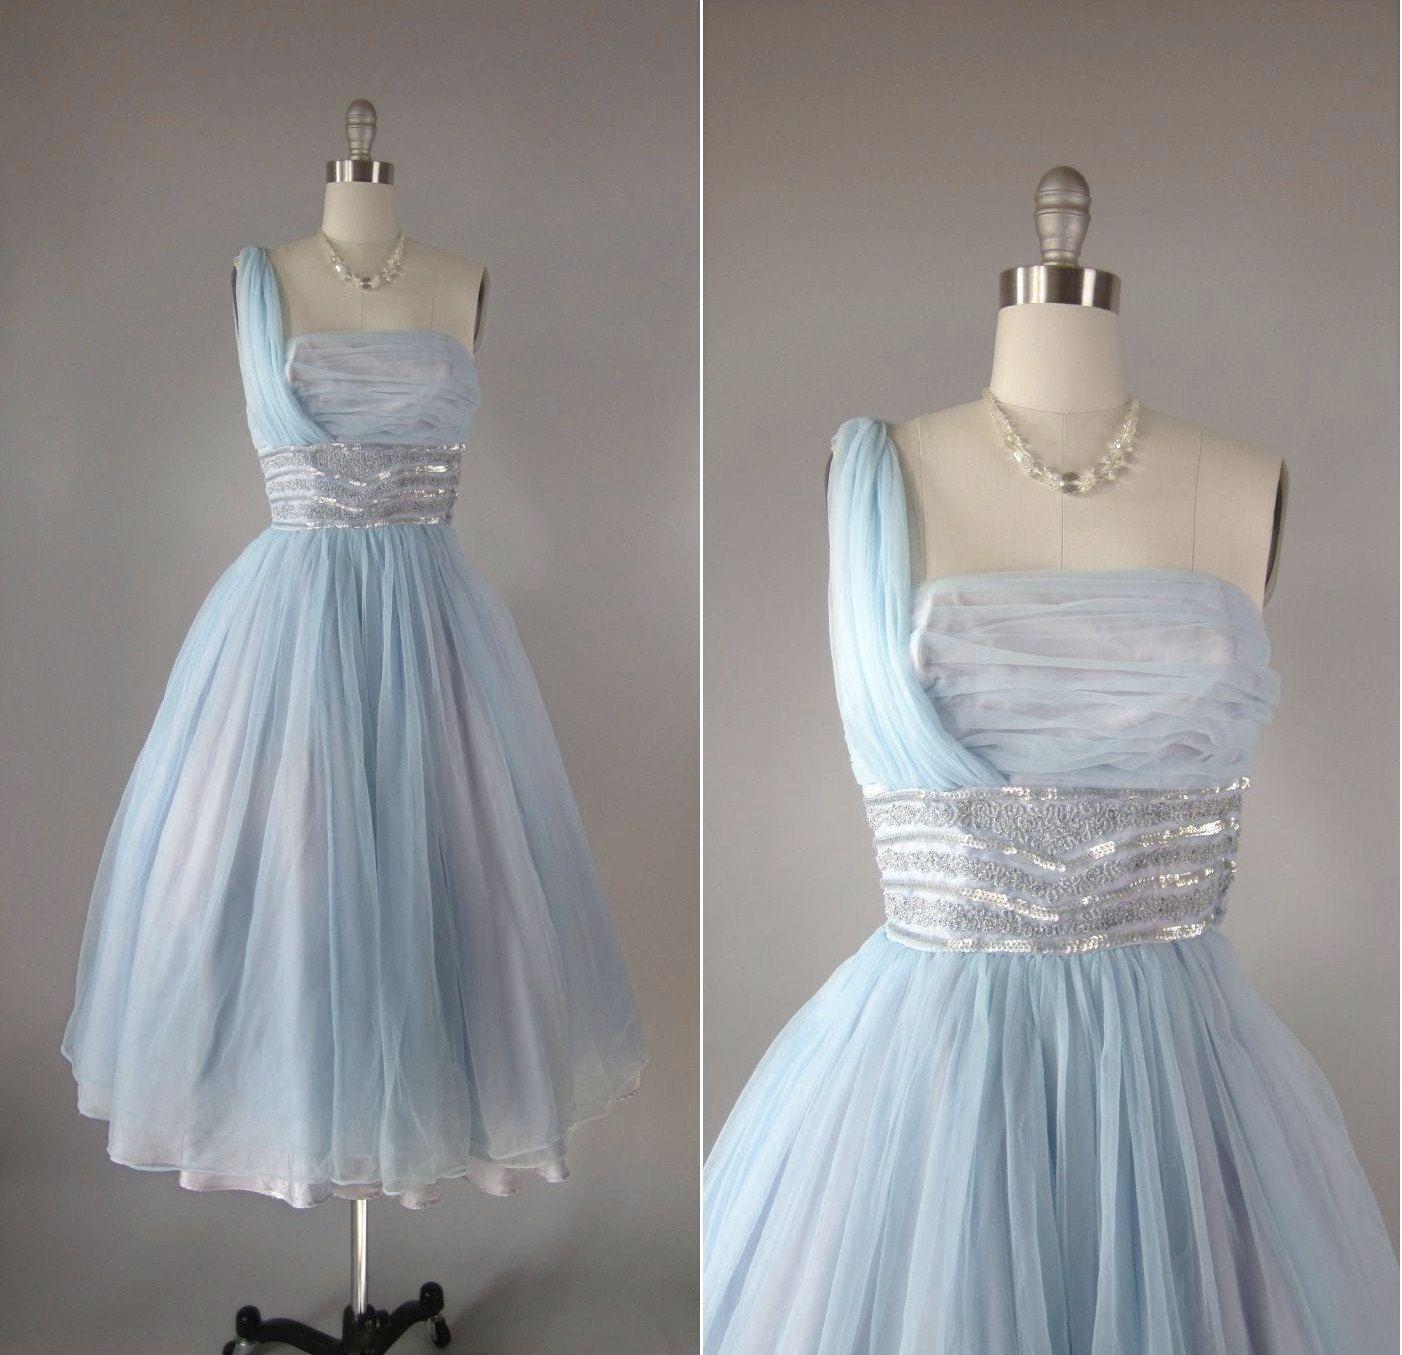 Vintage s prom dress fashion pinterest s prom dress